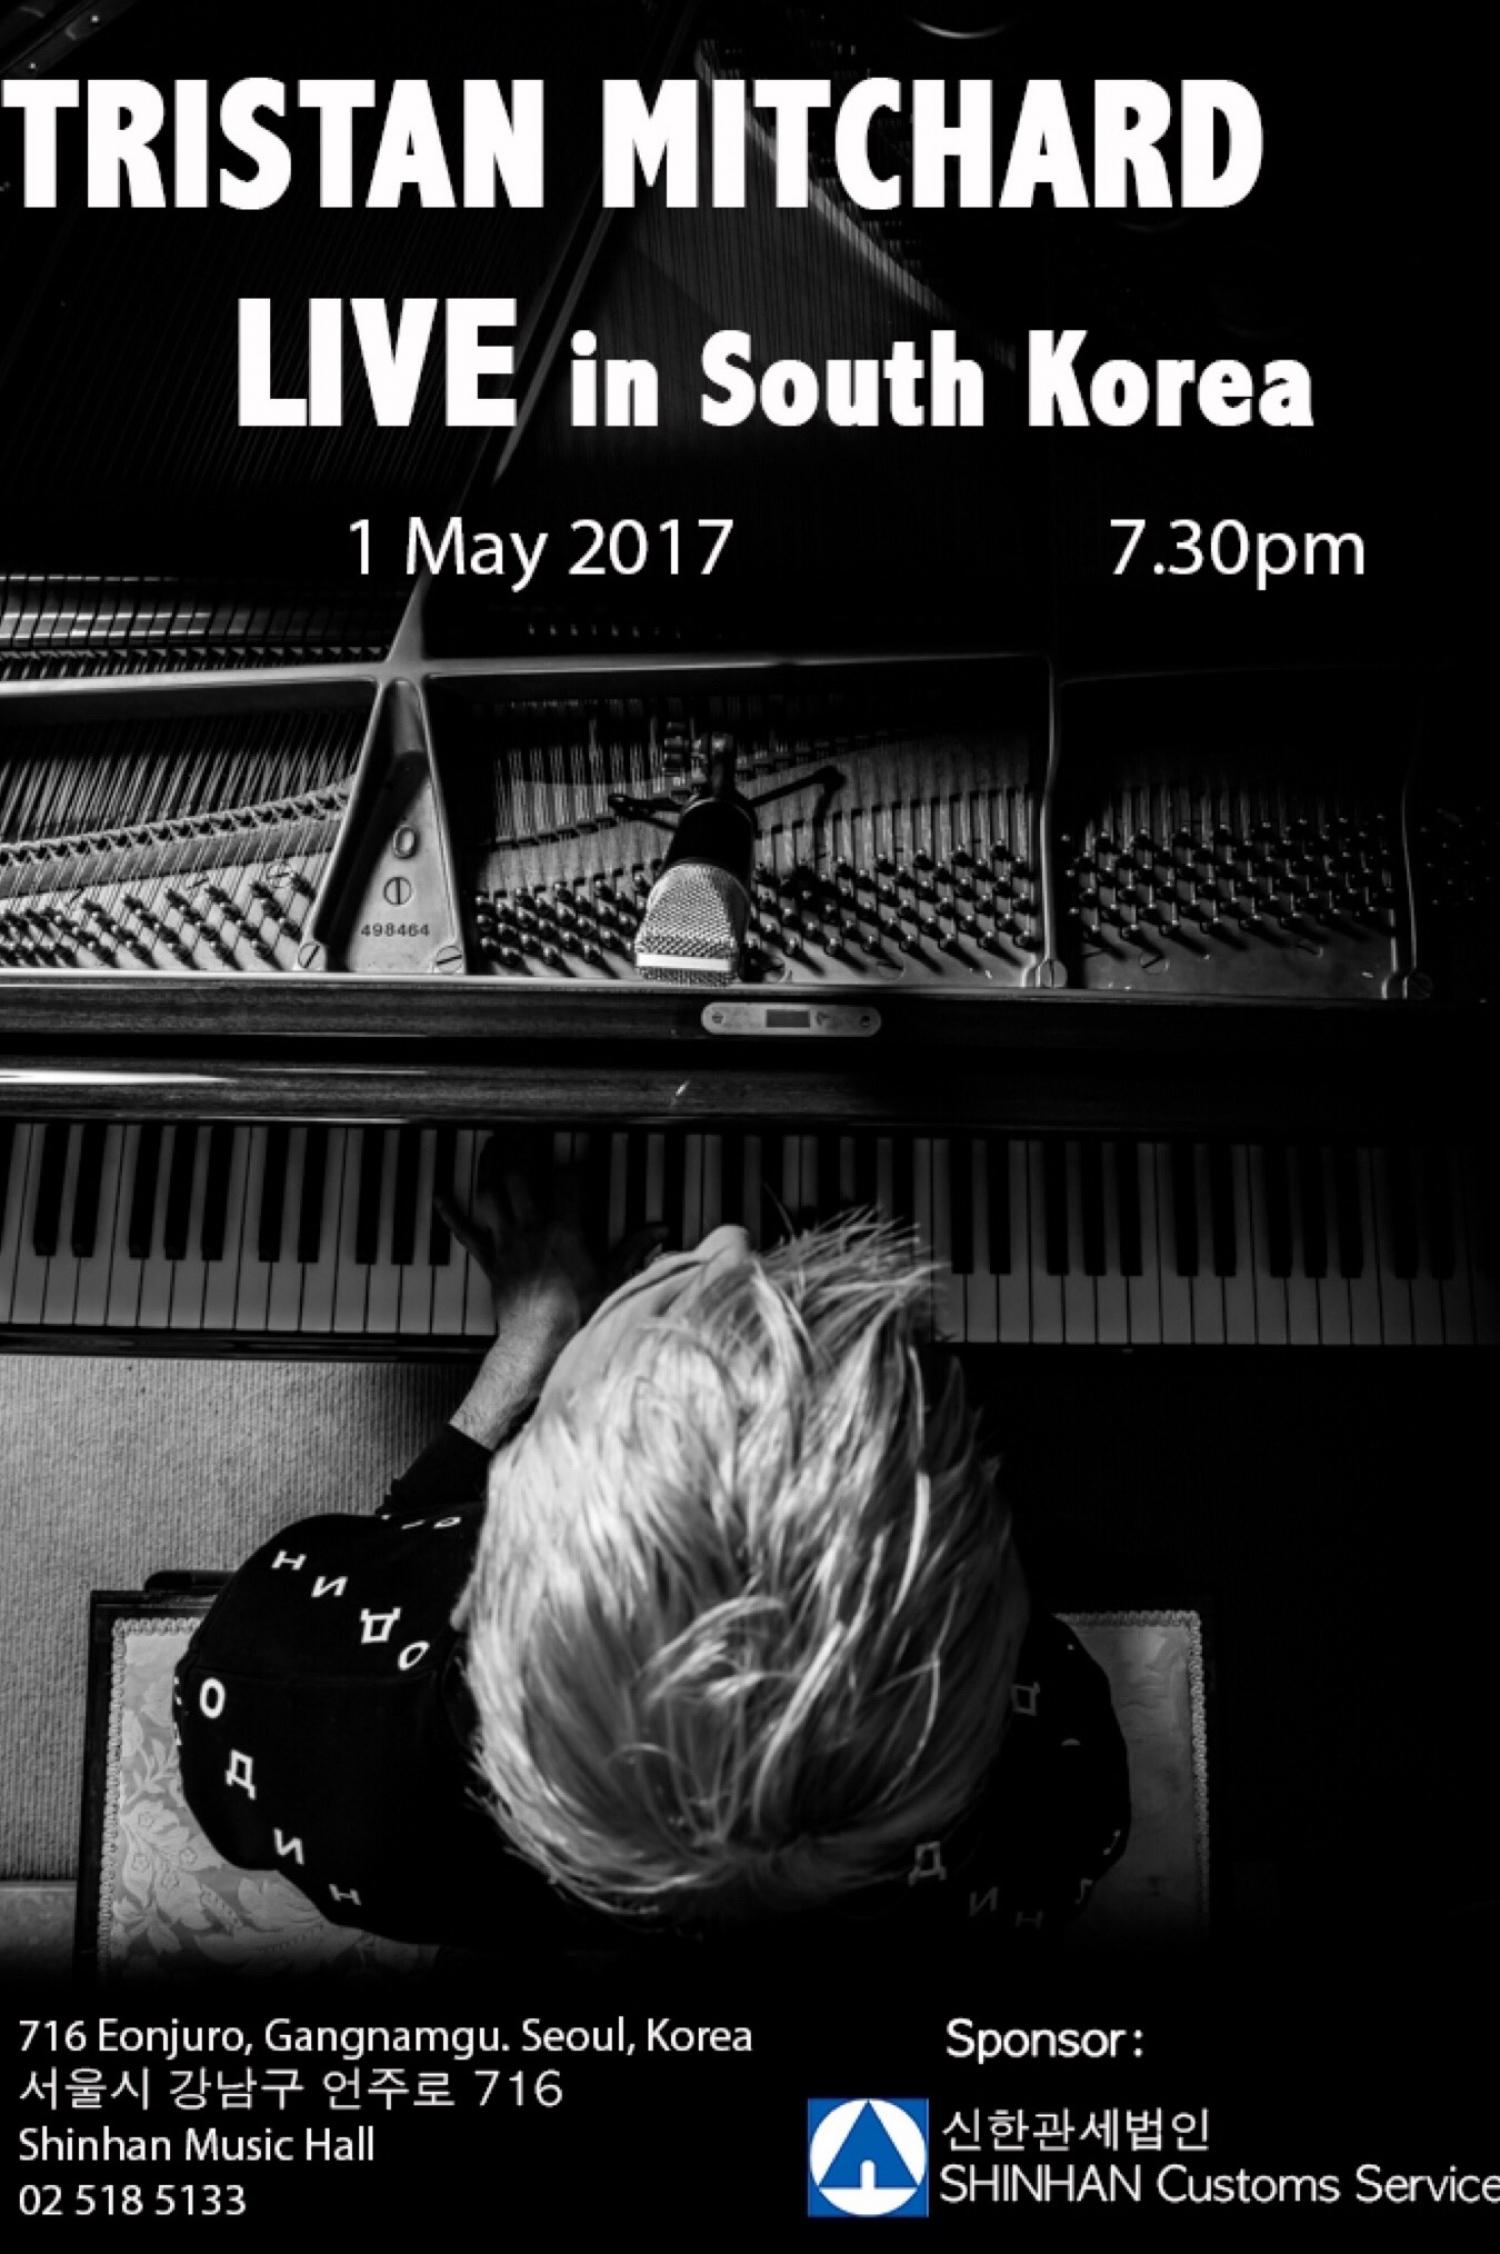 Tristan Mitchard Live In Seoul